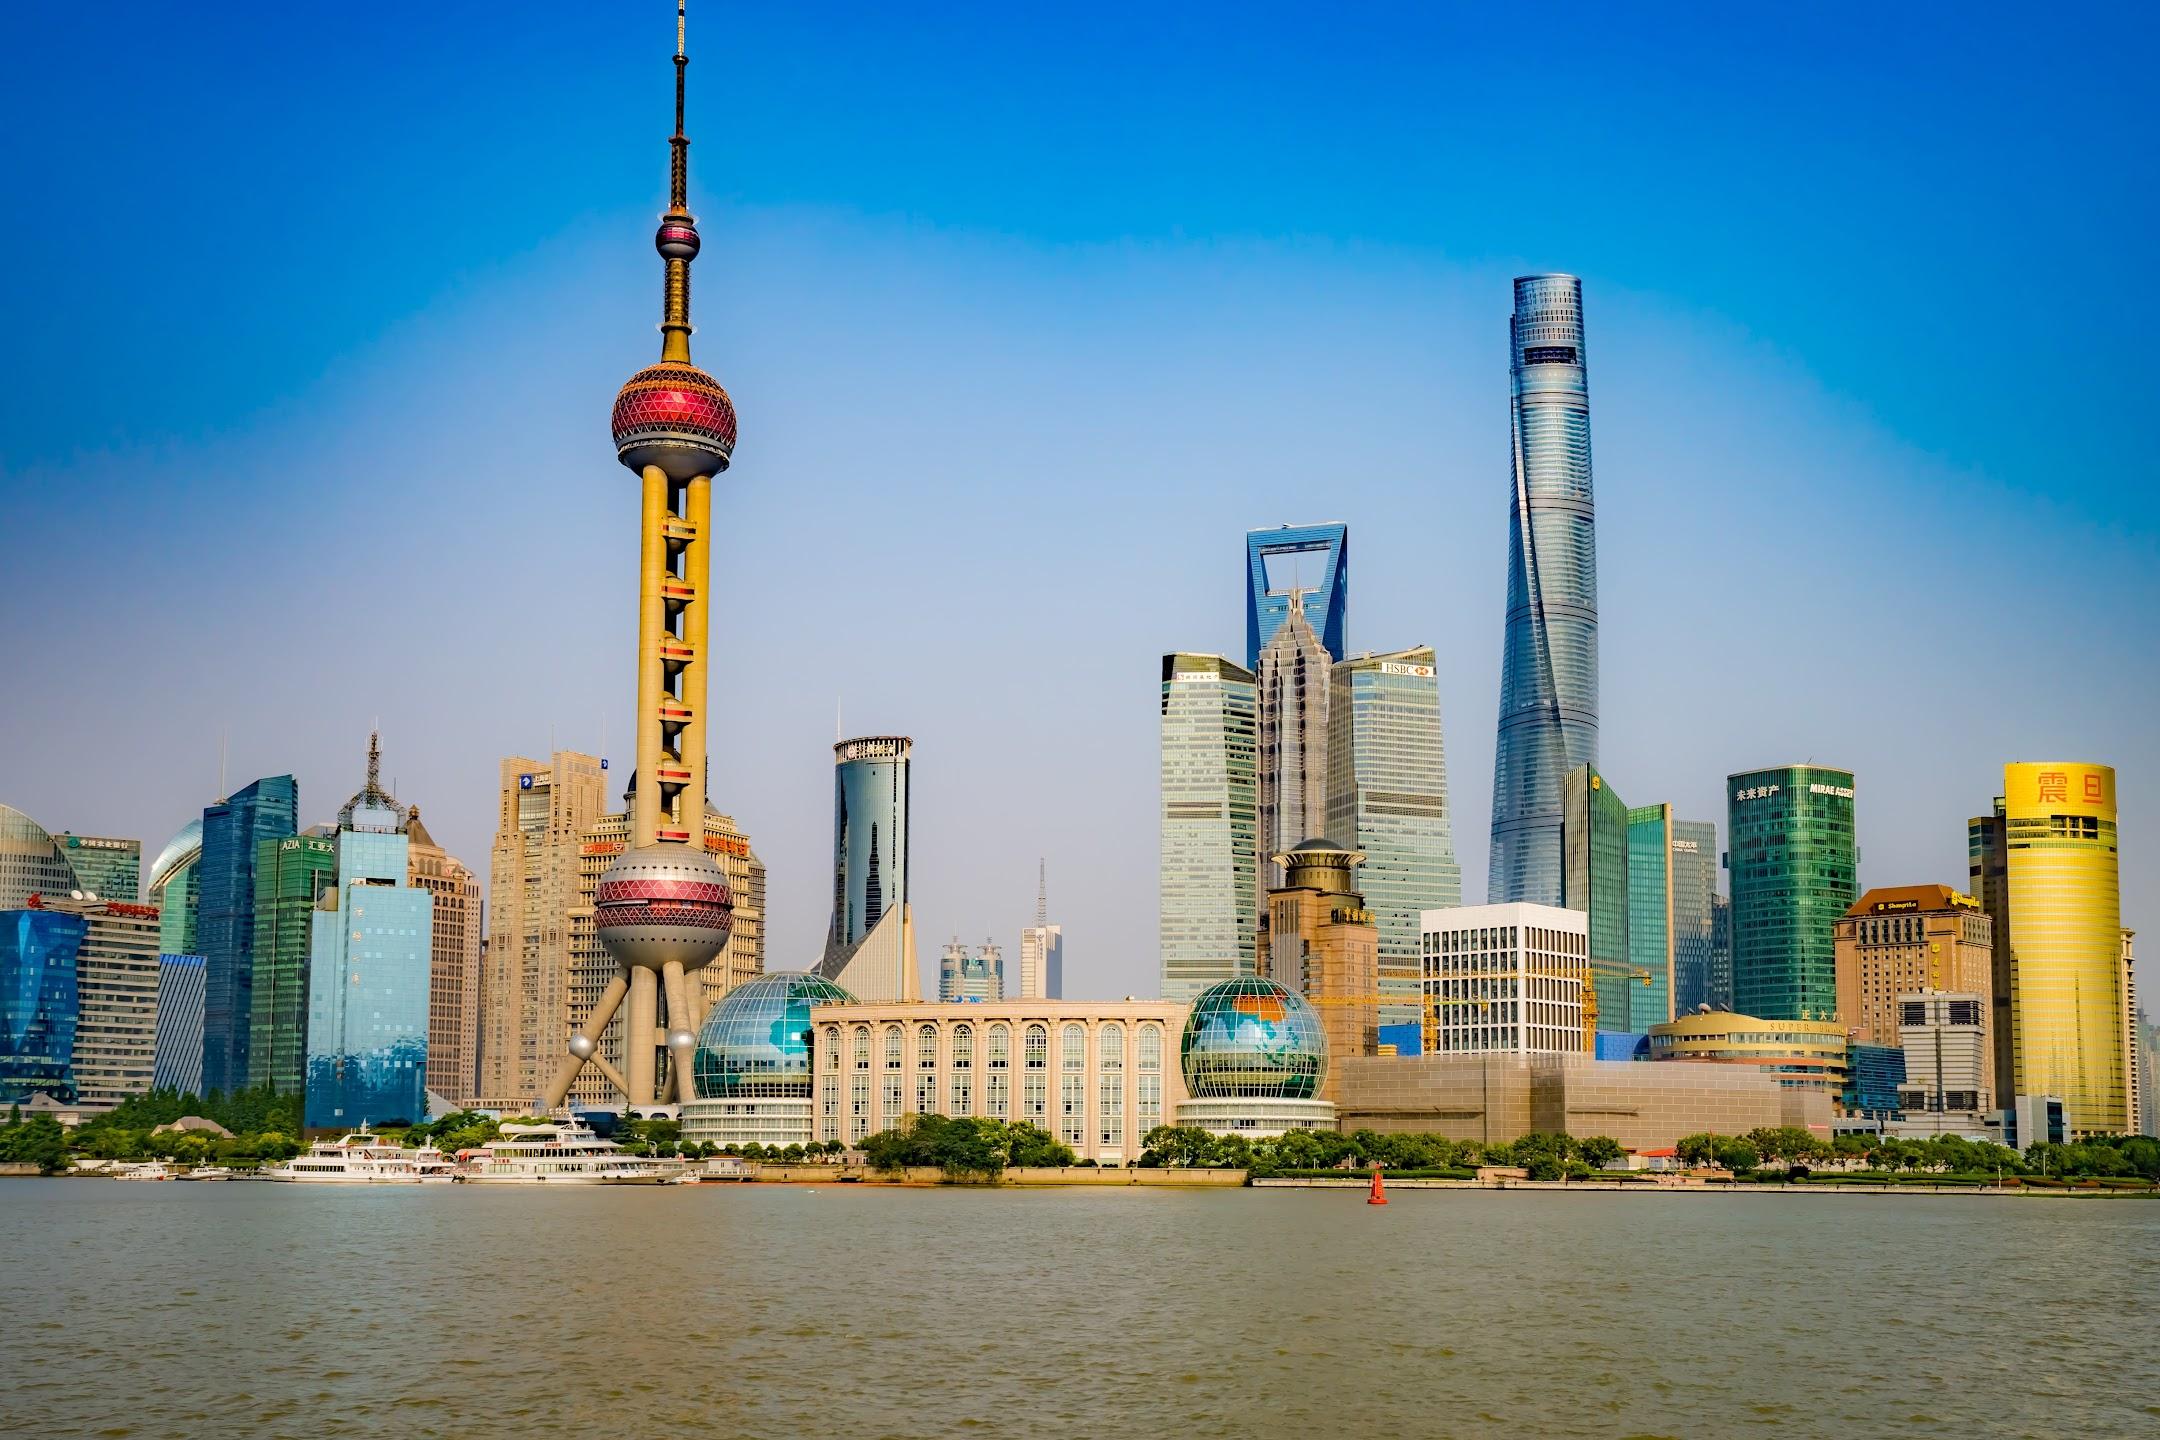 Shanghai Waitan (The Bund) Pudong1